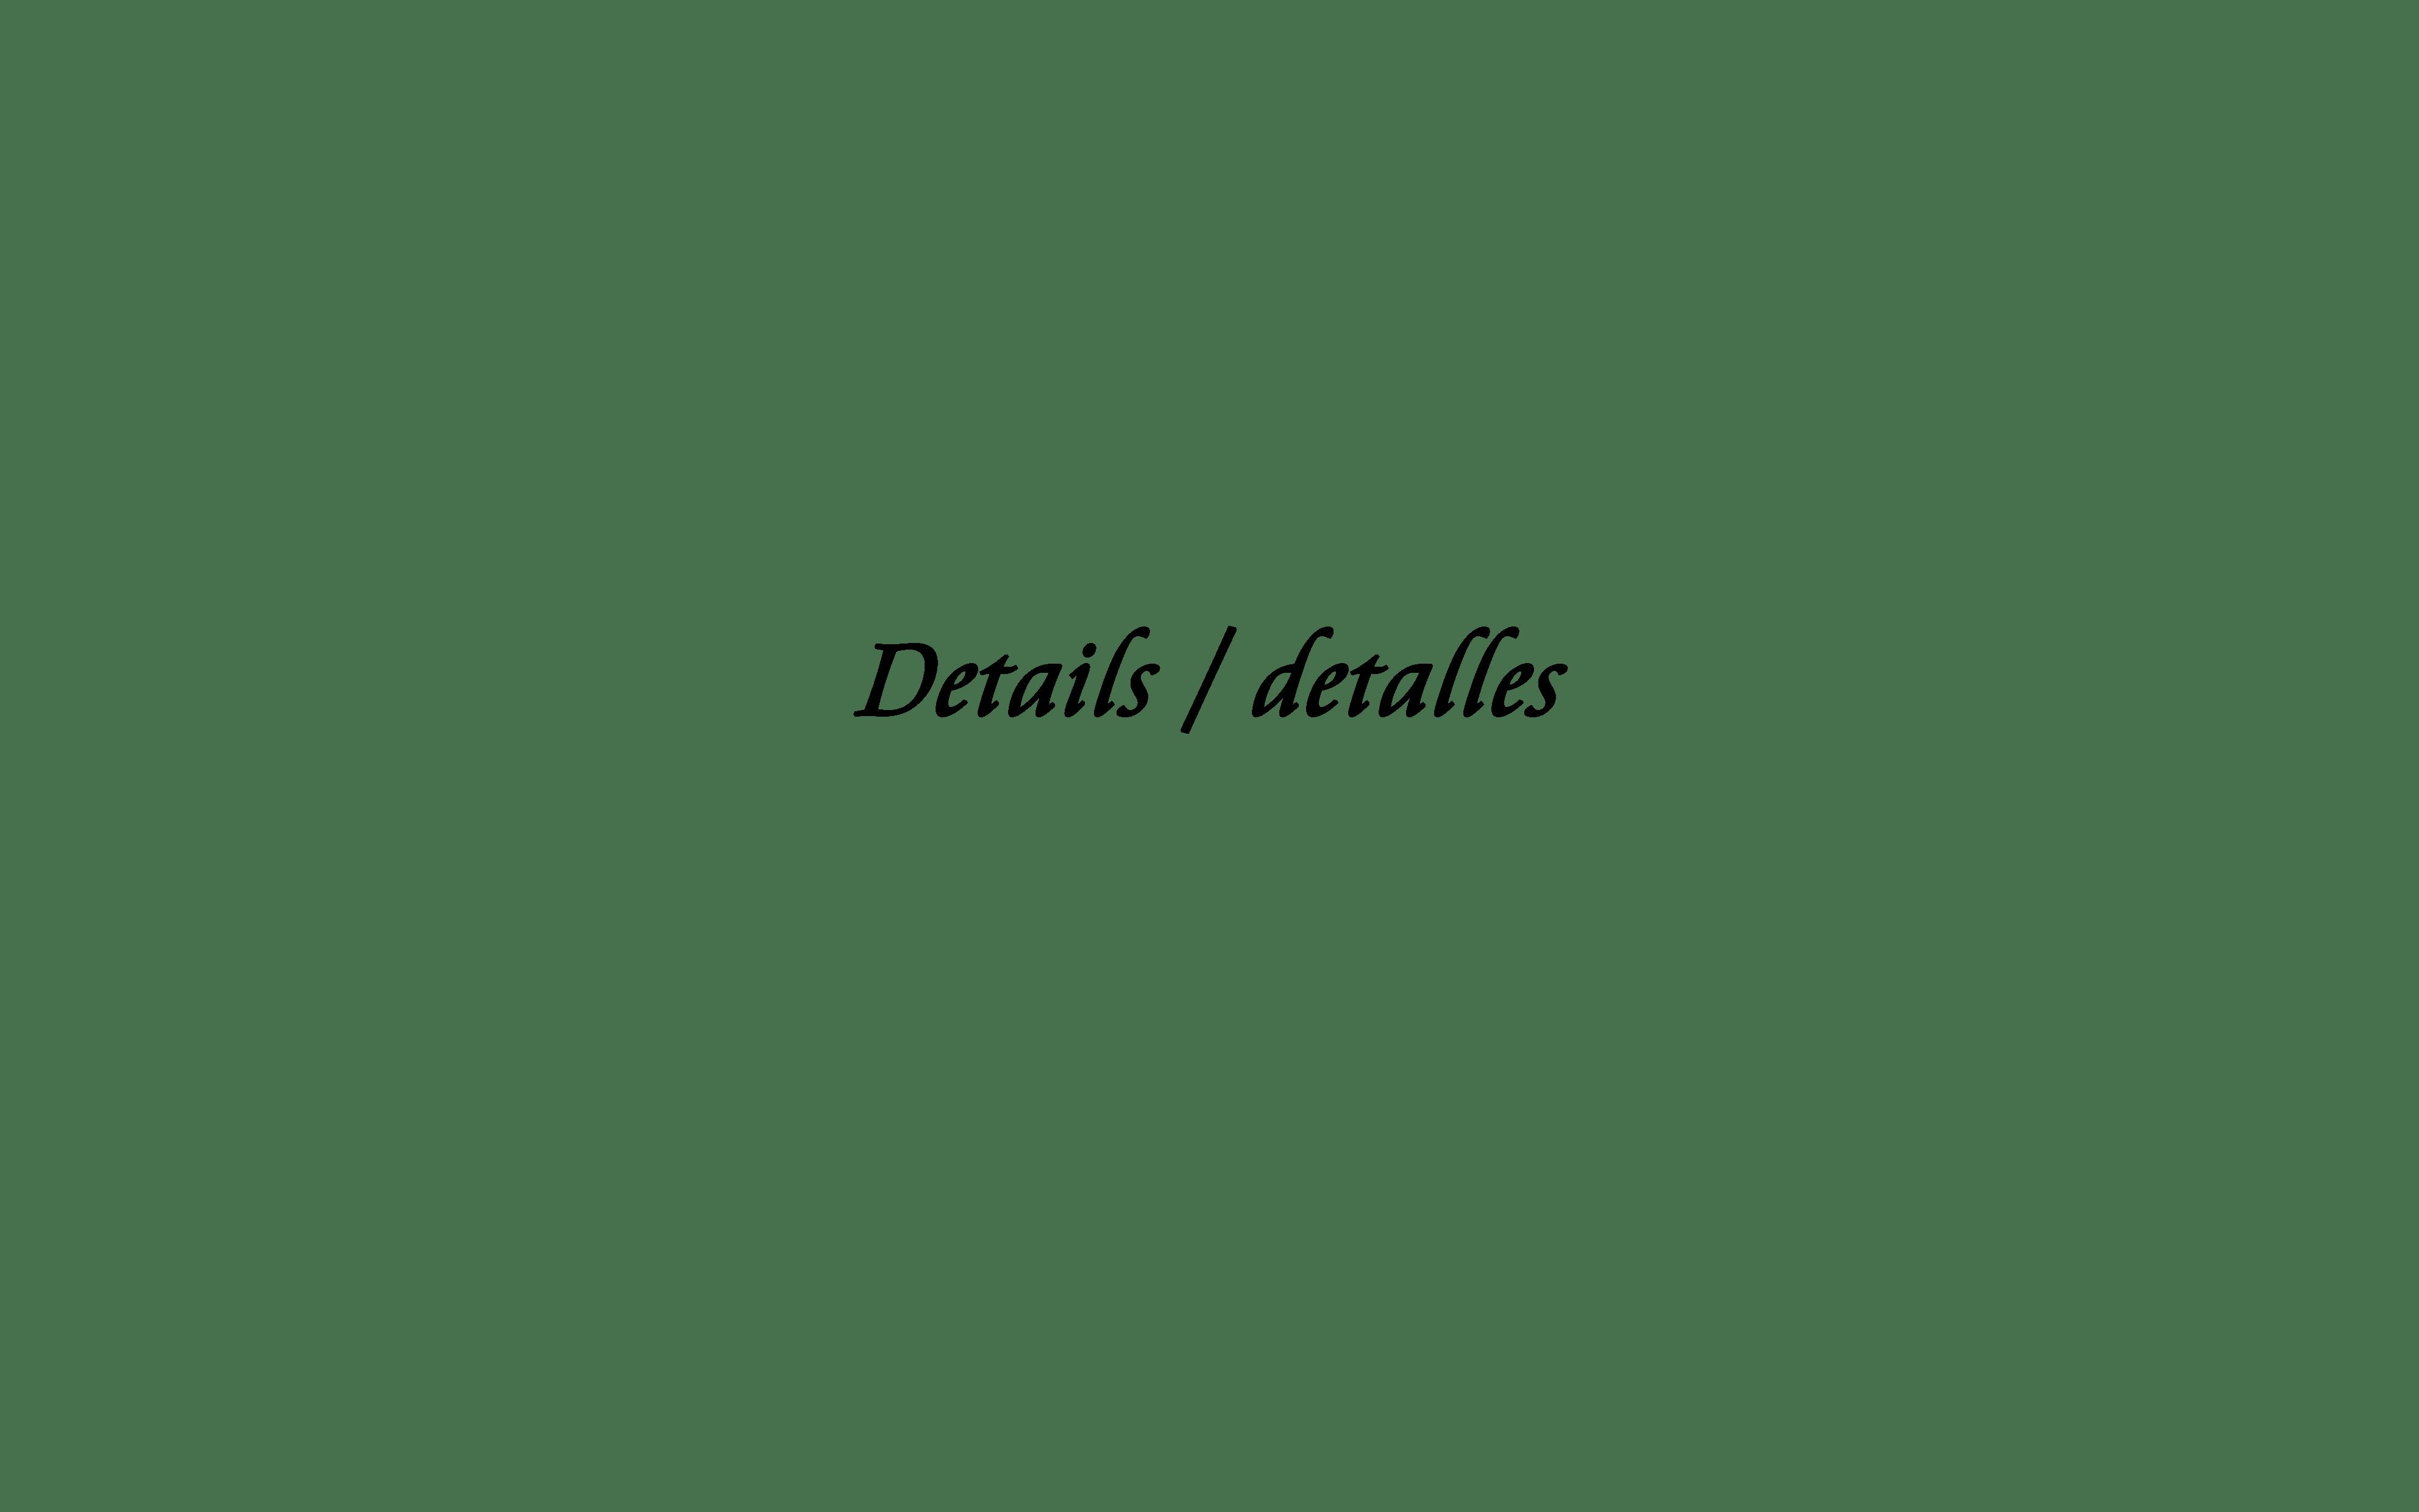 1400x875